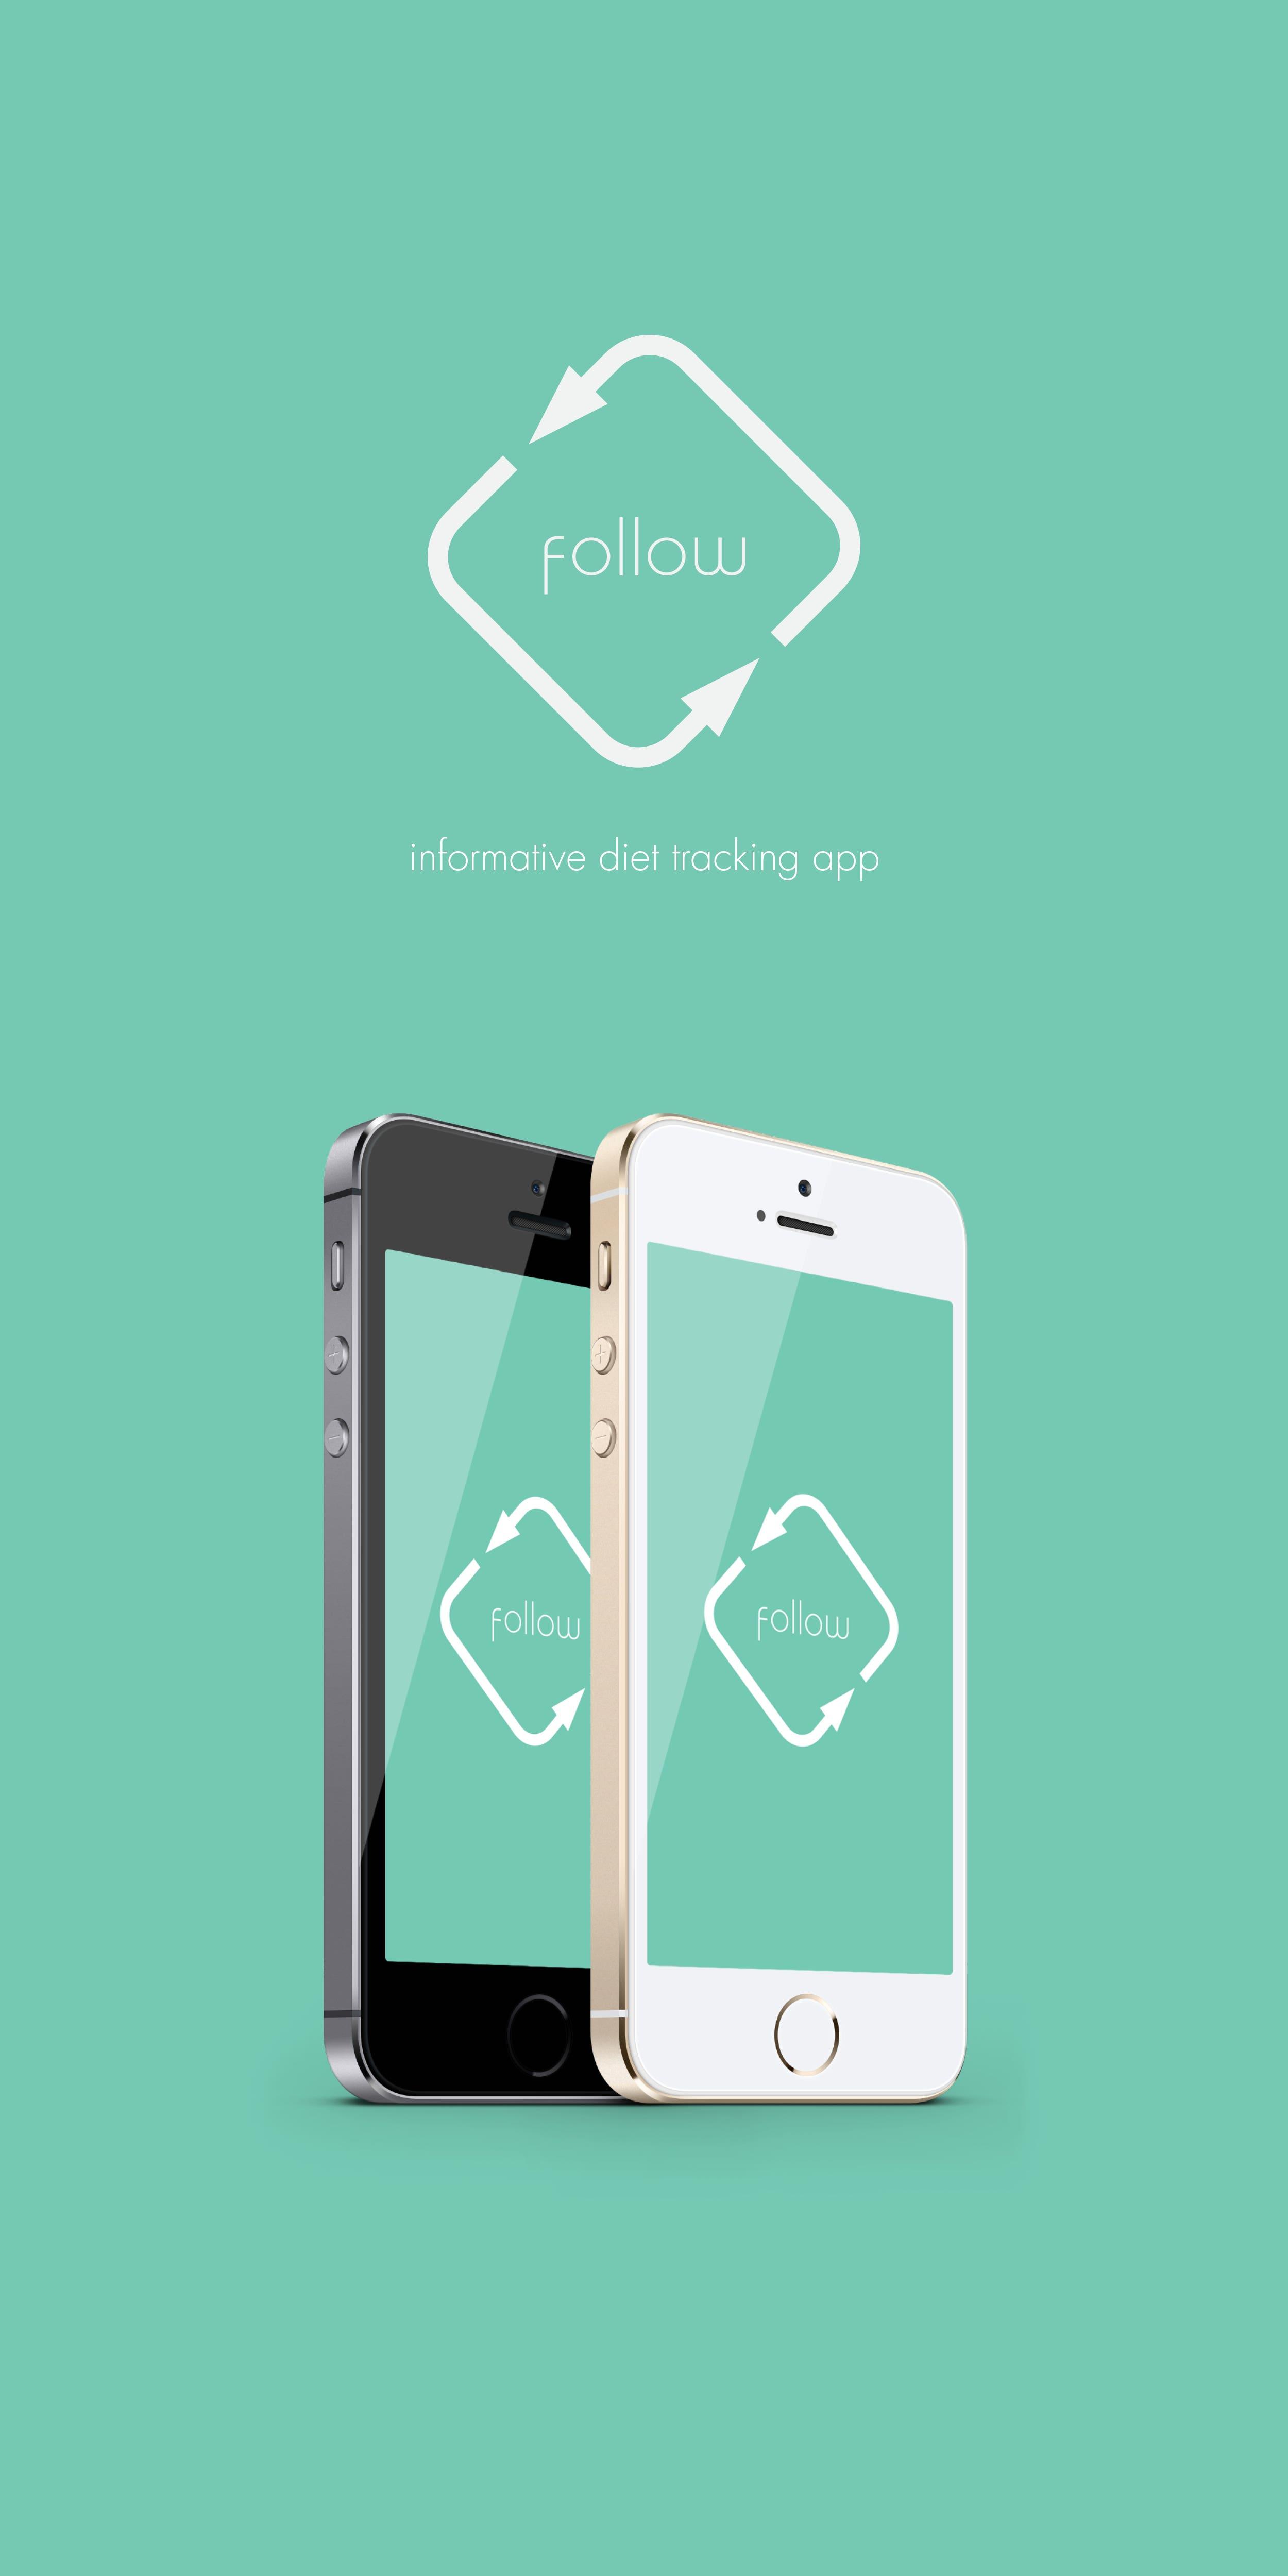 Follow - Diet Tracking App